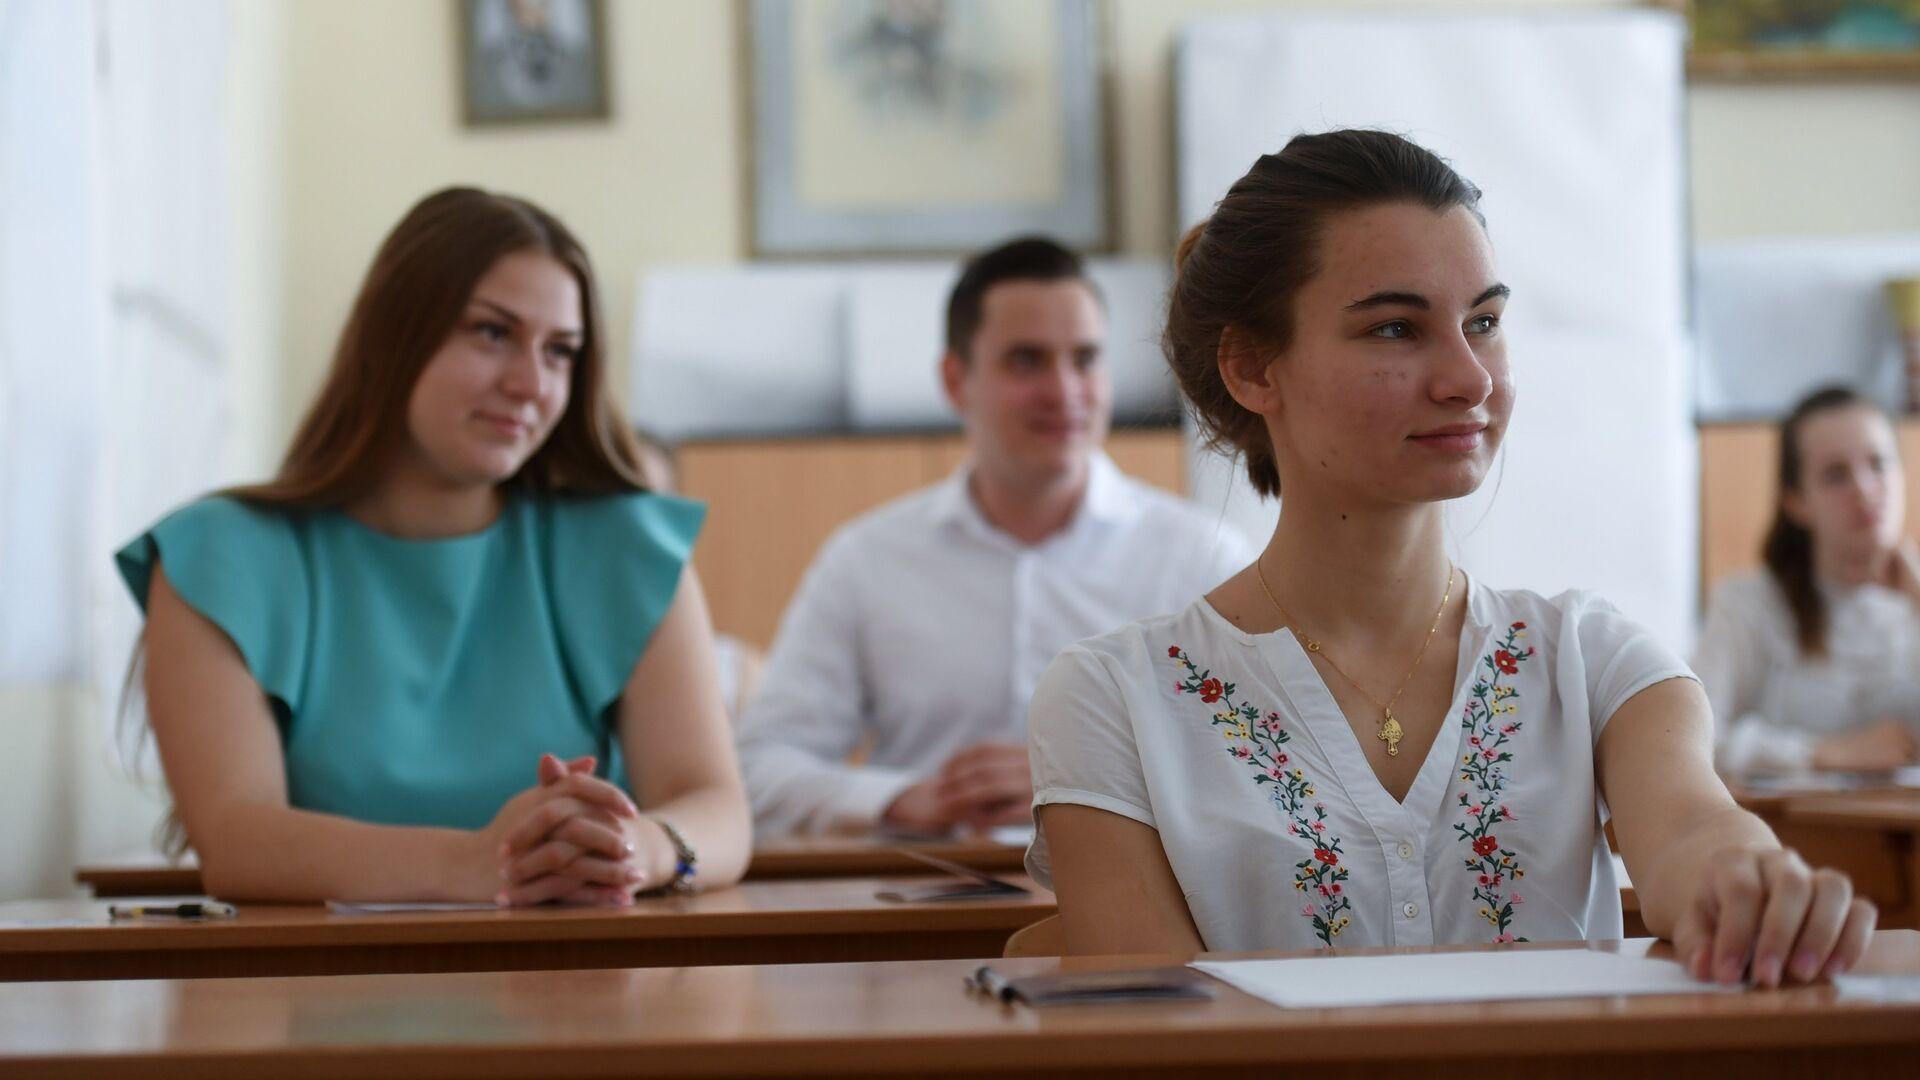 Ученики в классе - РИА Новости, 1920, 23.09.2020